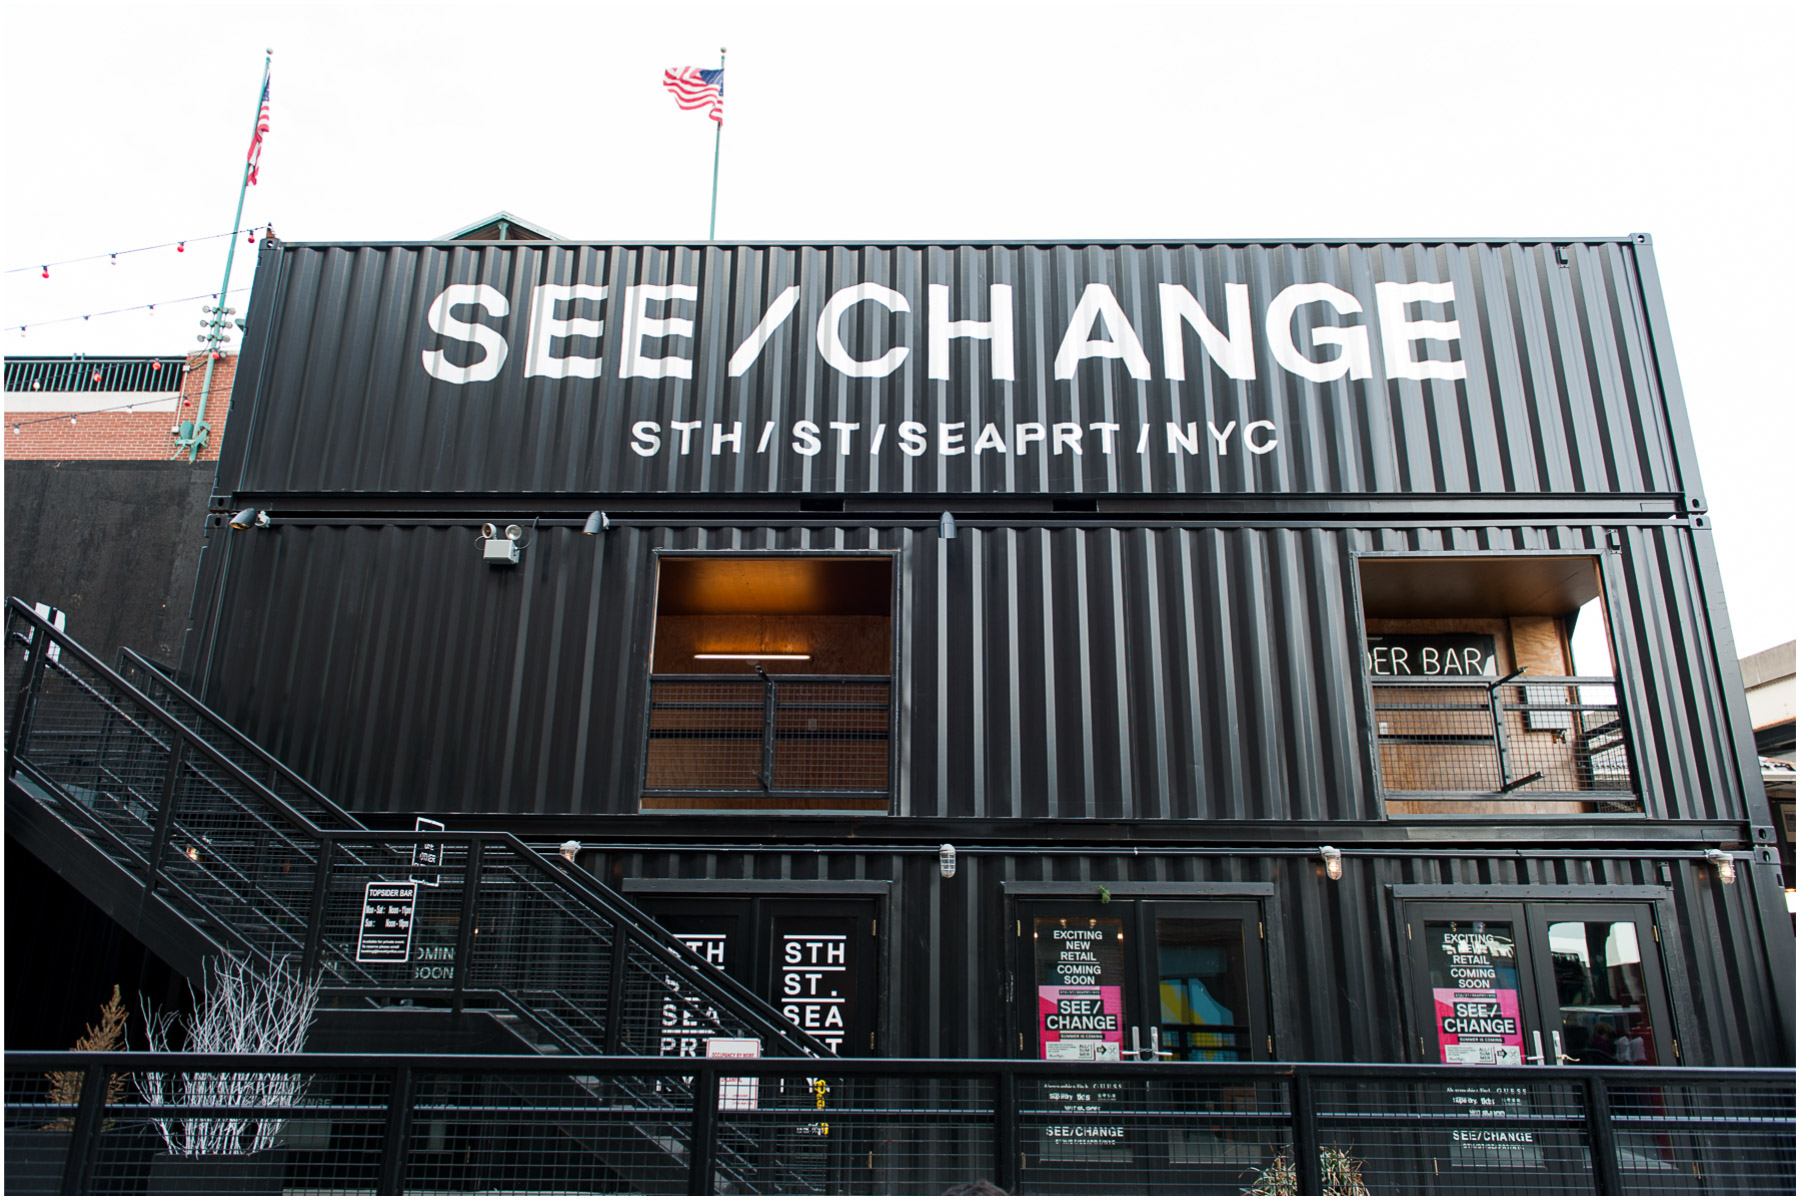 South-Street-Seaport-NYC-FIDI_11.jpg